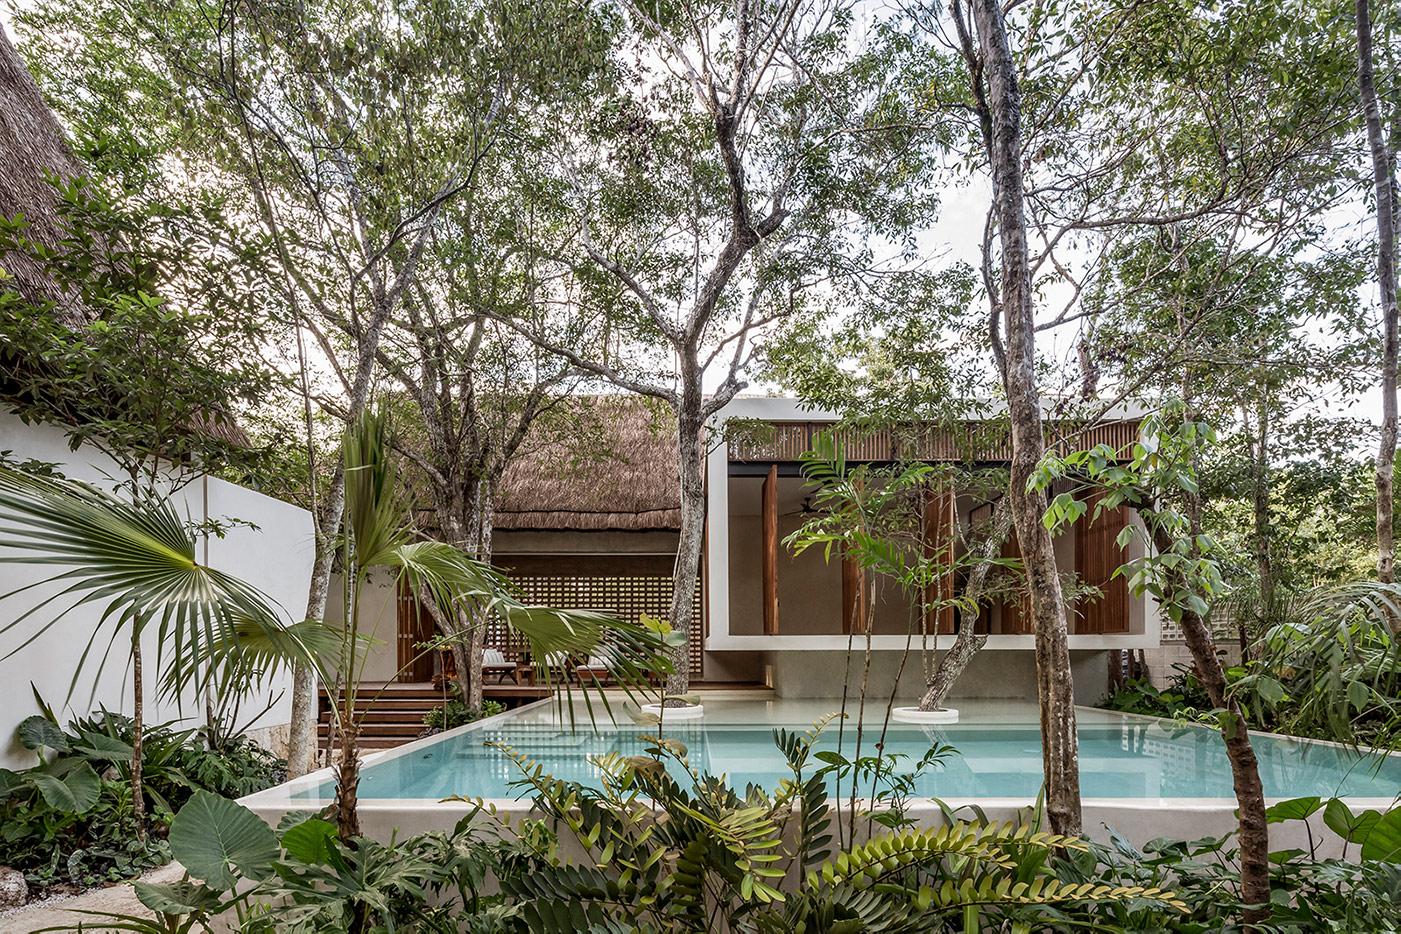 Boutique Jungle Hotel And Retreats Jungle Keva Tulum